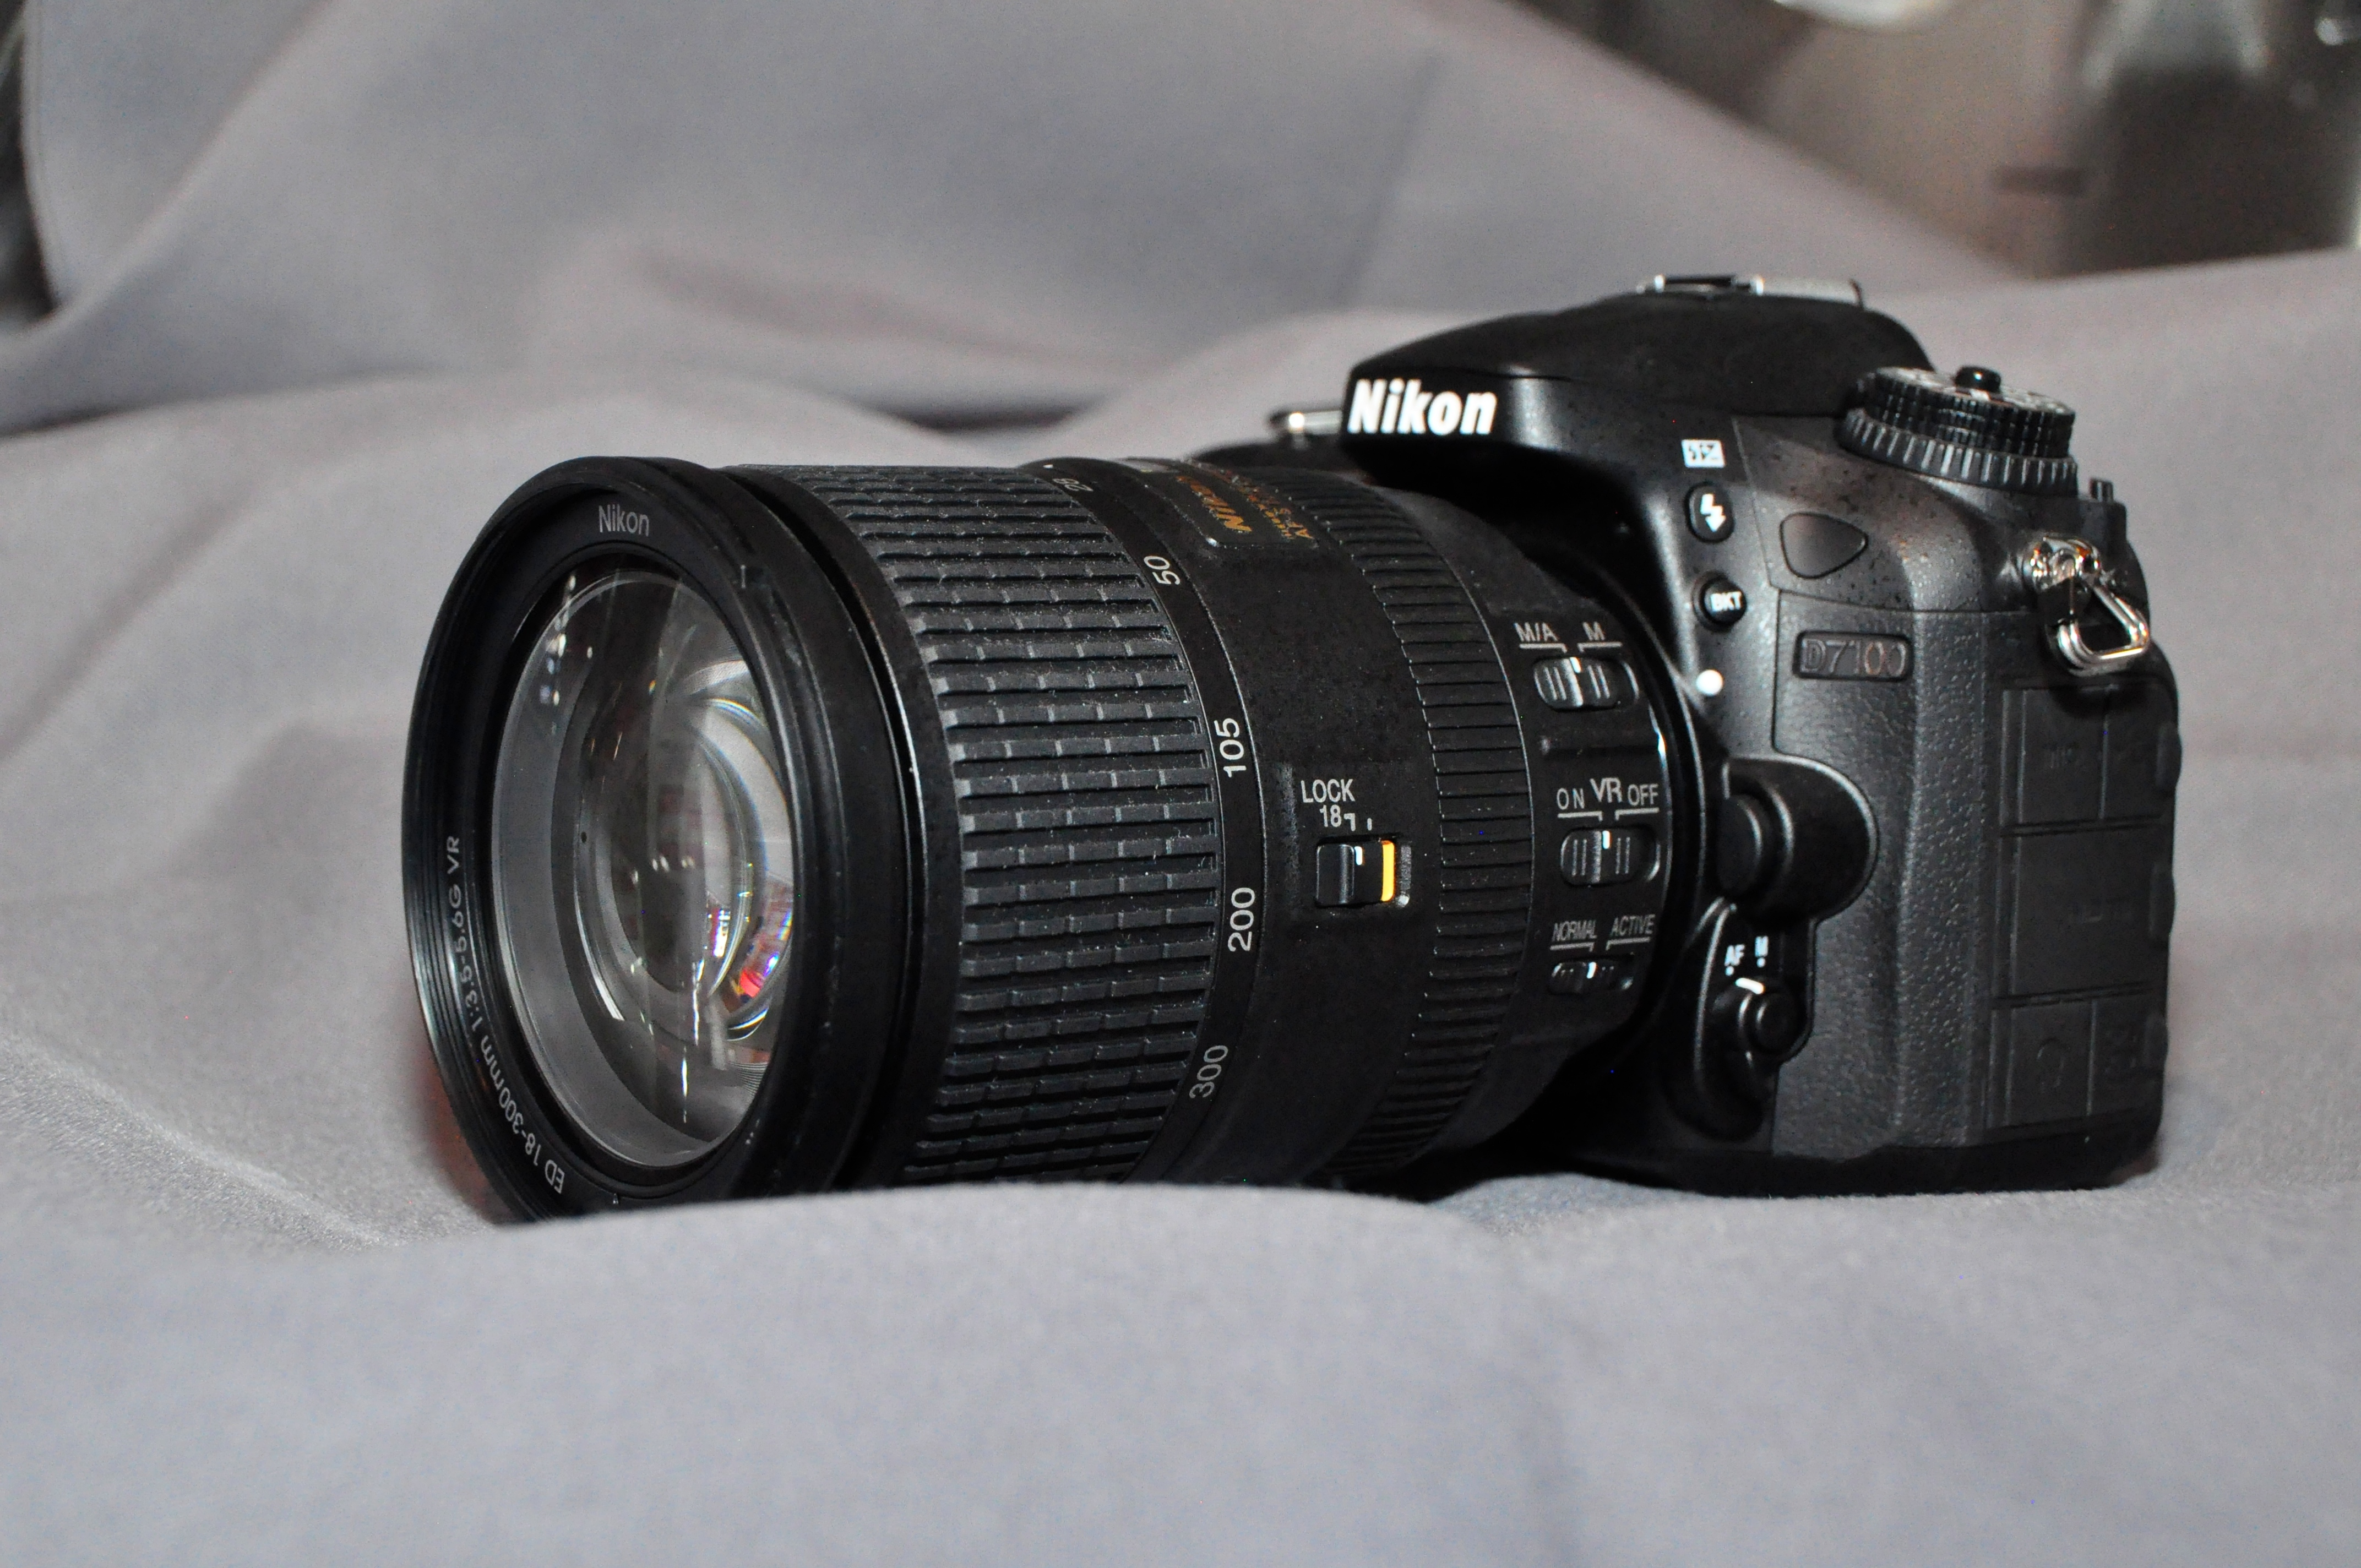 Nikkor 18-300 on a Nikon D7100 body